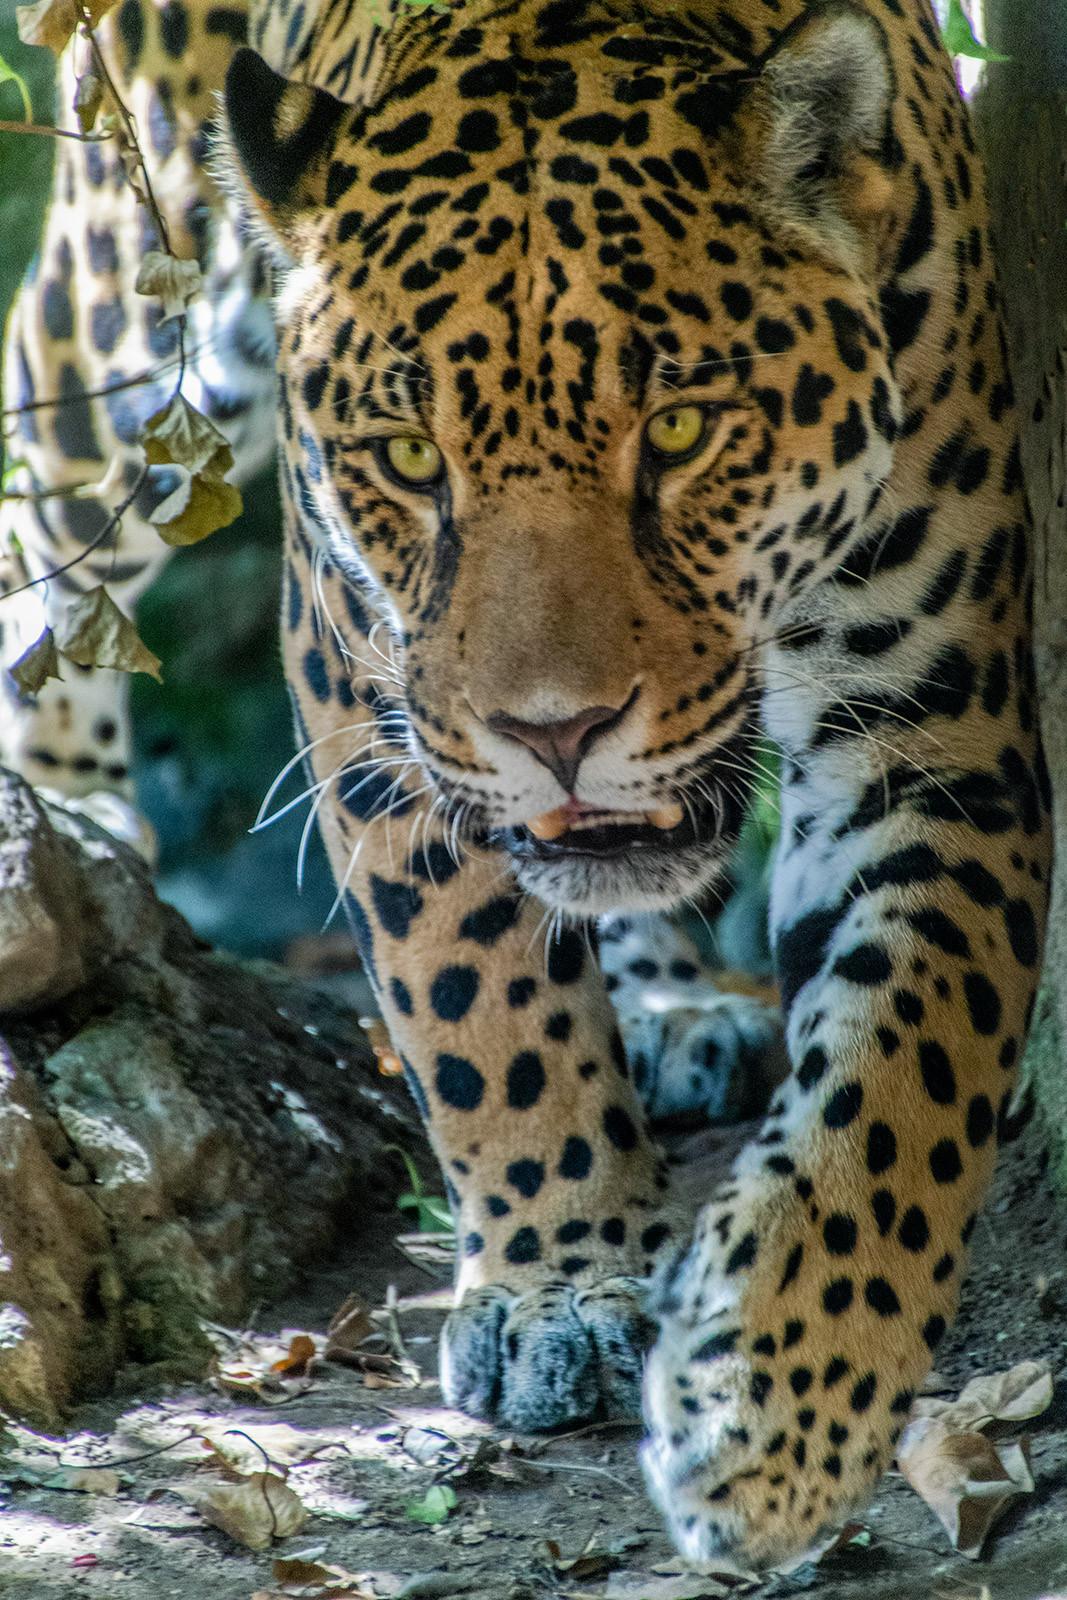 PDI - On the Prowl by Iris Rainey (11 marks)